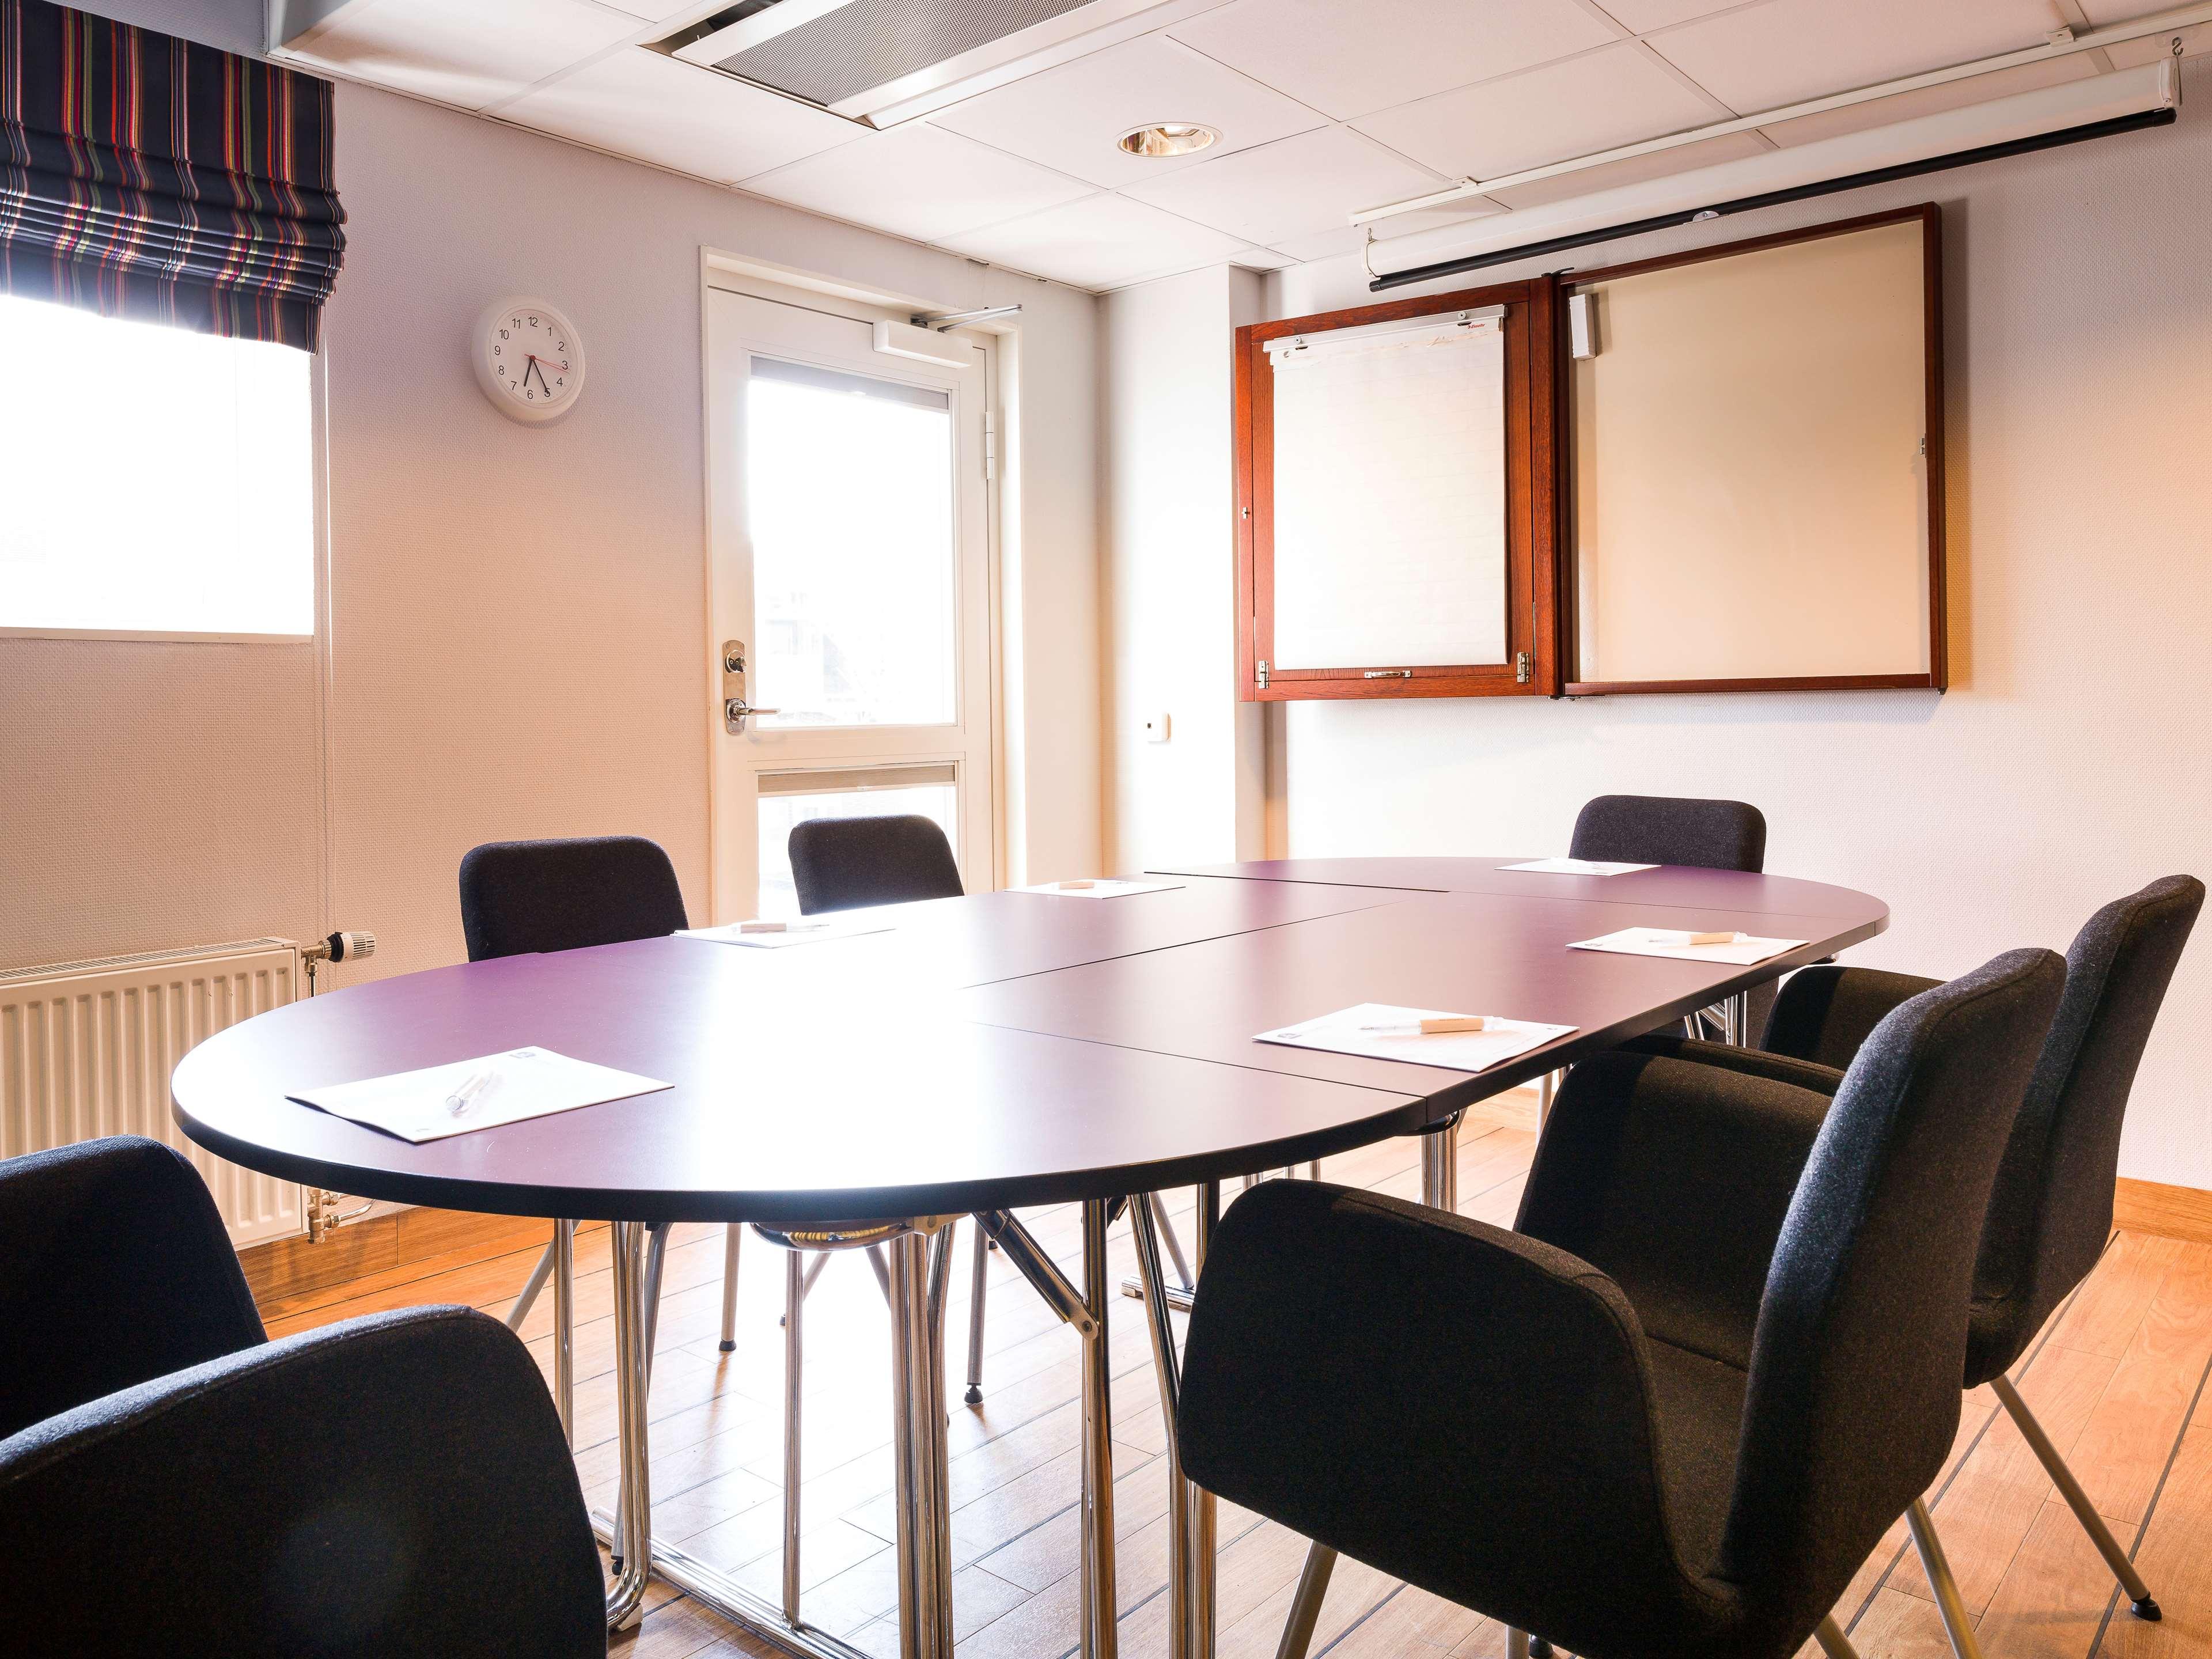 John's Meeting Room